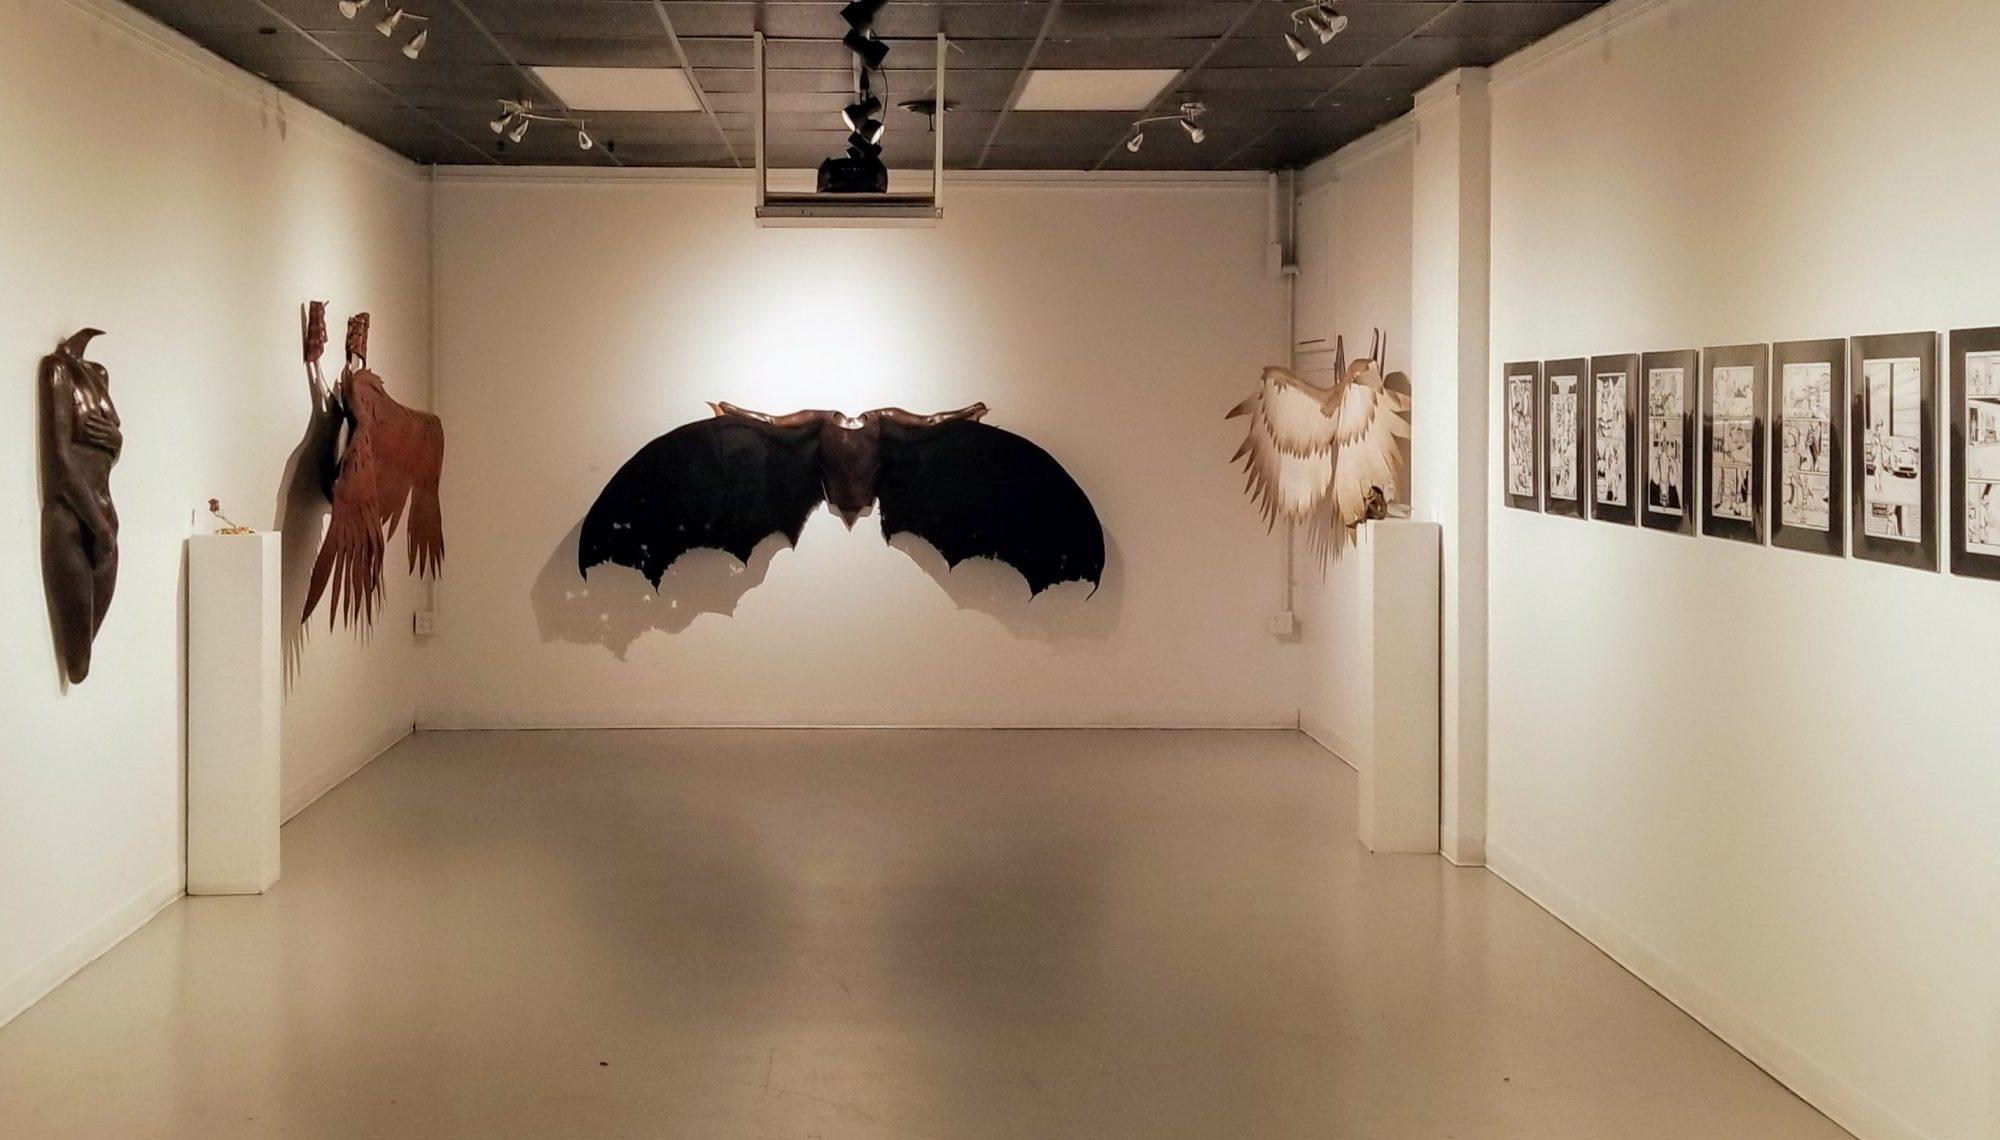 Dimensions Gallery Show - Cyclops Studios Adam Nahas in May 2019